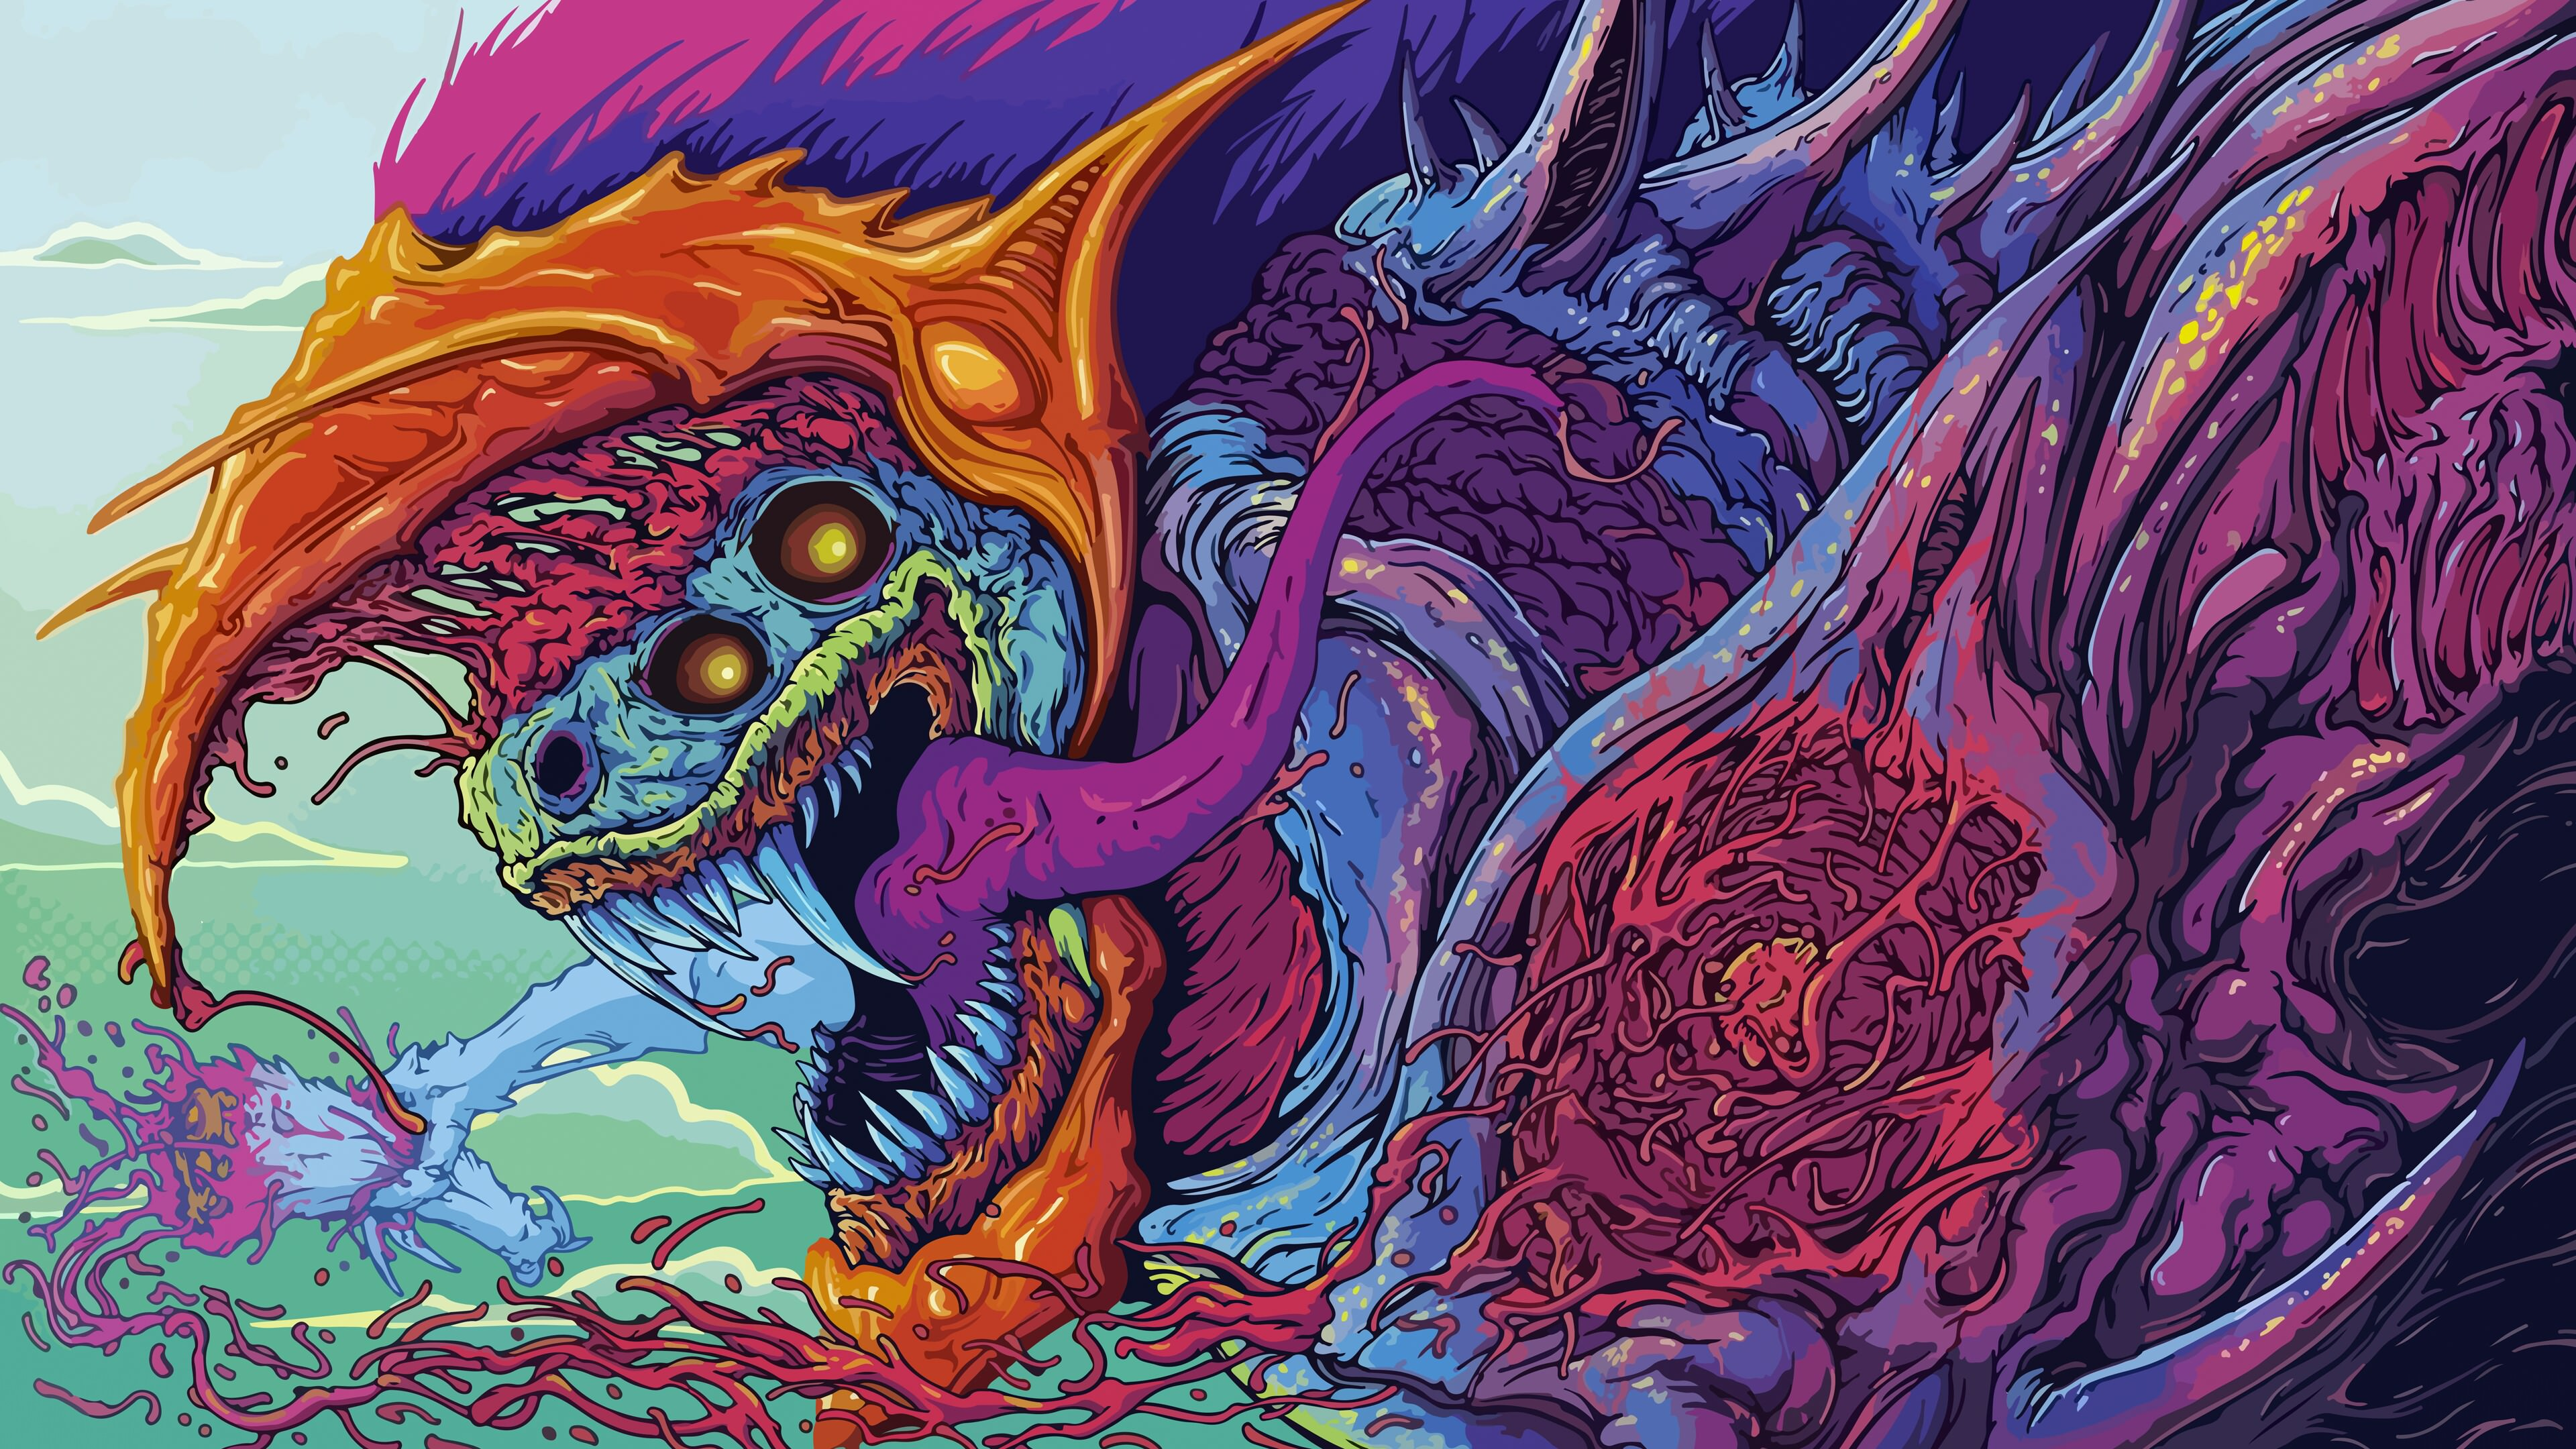 hyper beast wallpaper 4k 3840x2160 download hd wallpaper wallpapertip hyper beast wallpaper 4k 3840x2160